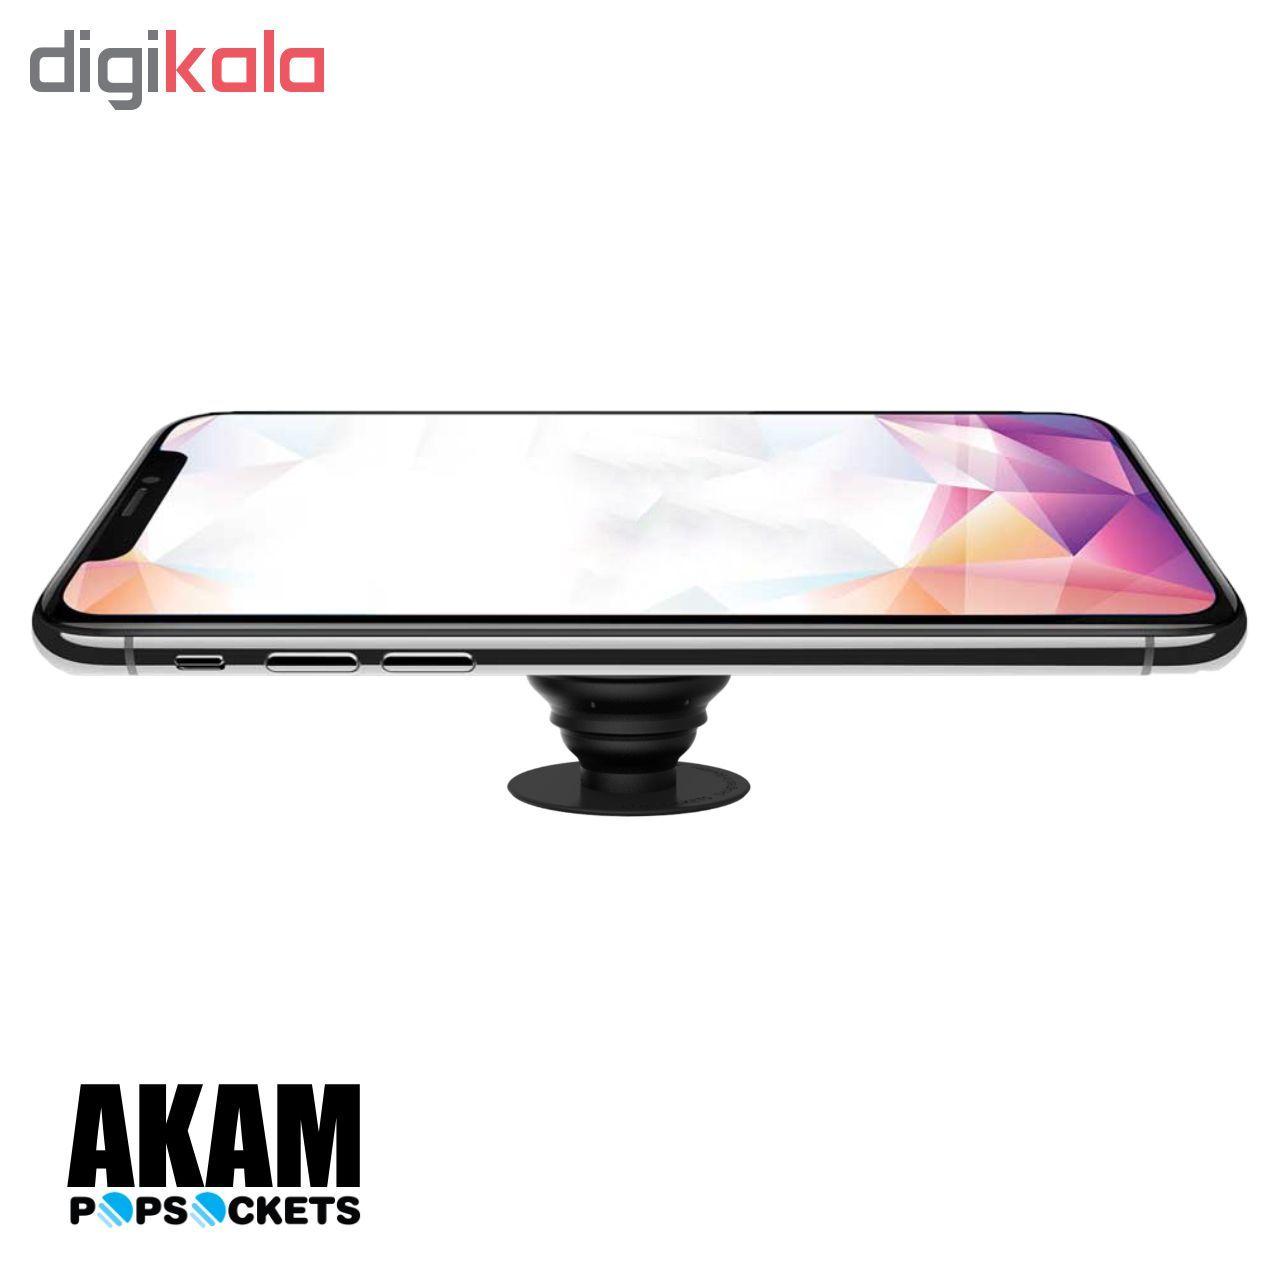 پایه نگهدارنده گوشی موبایل پاپ سوکت آکام مدل APS0056 main 1 10